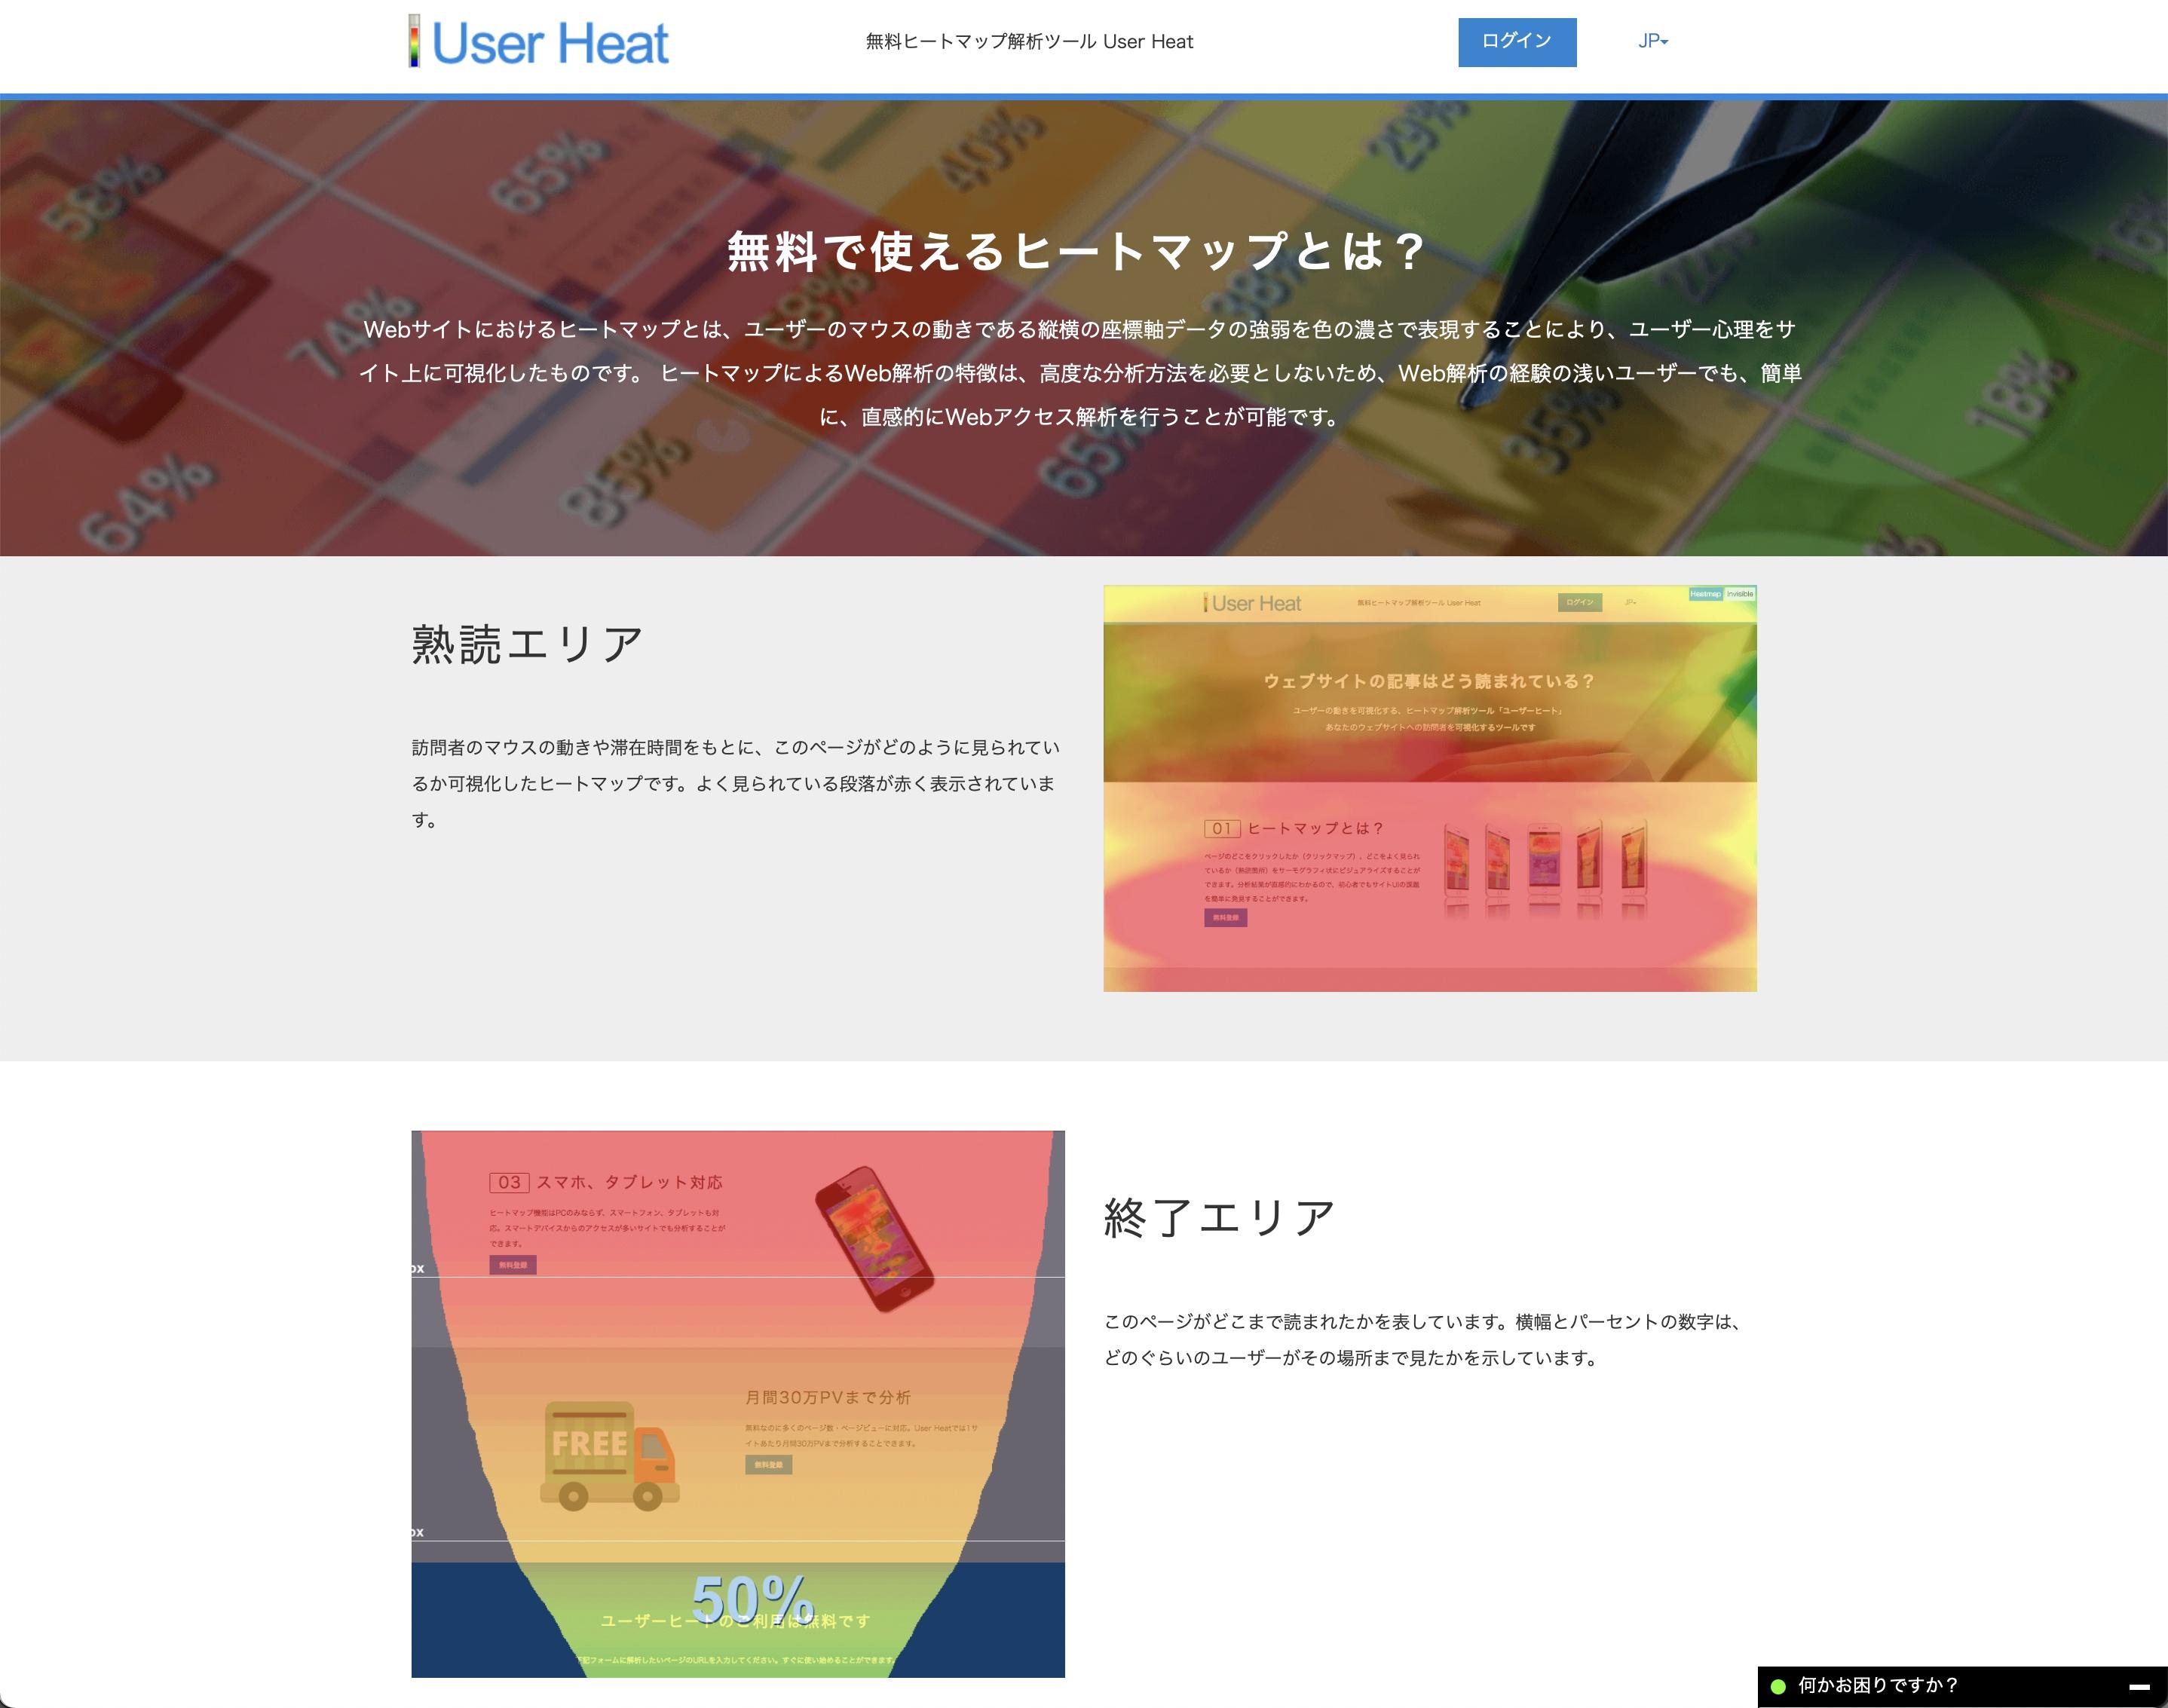 User Heat画面